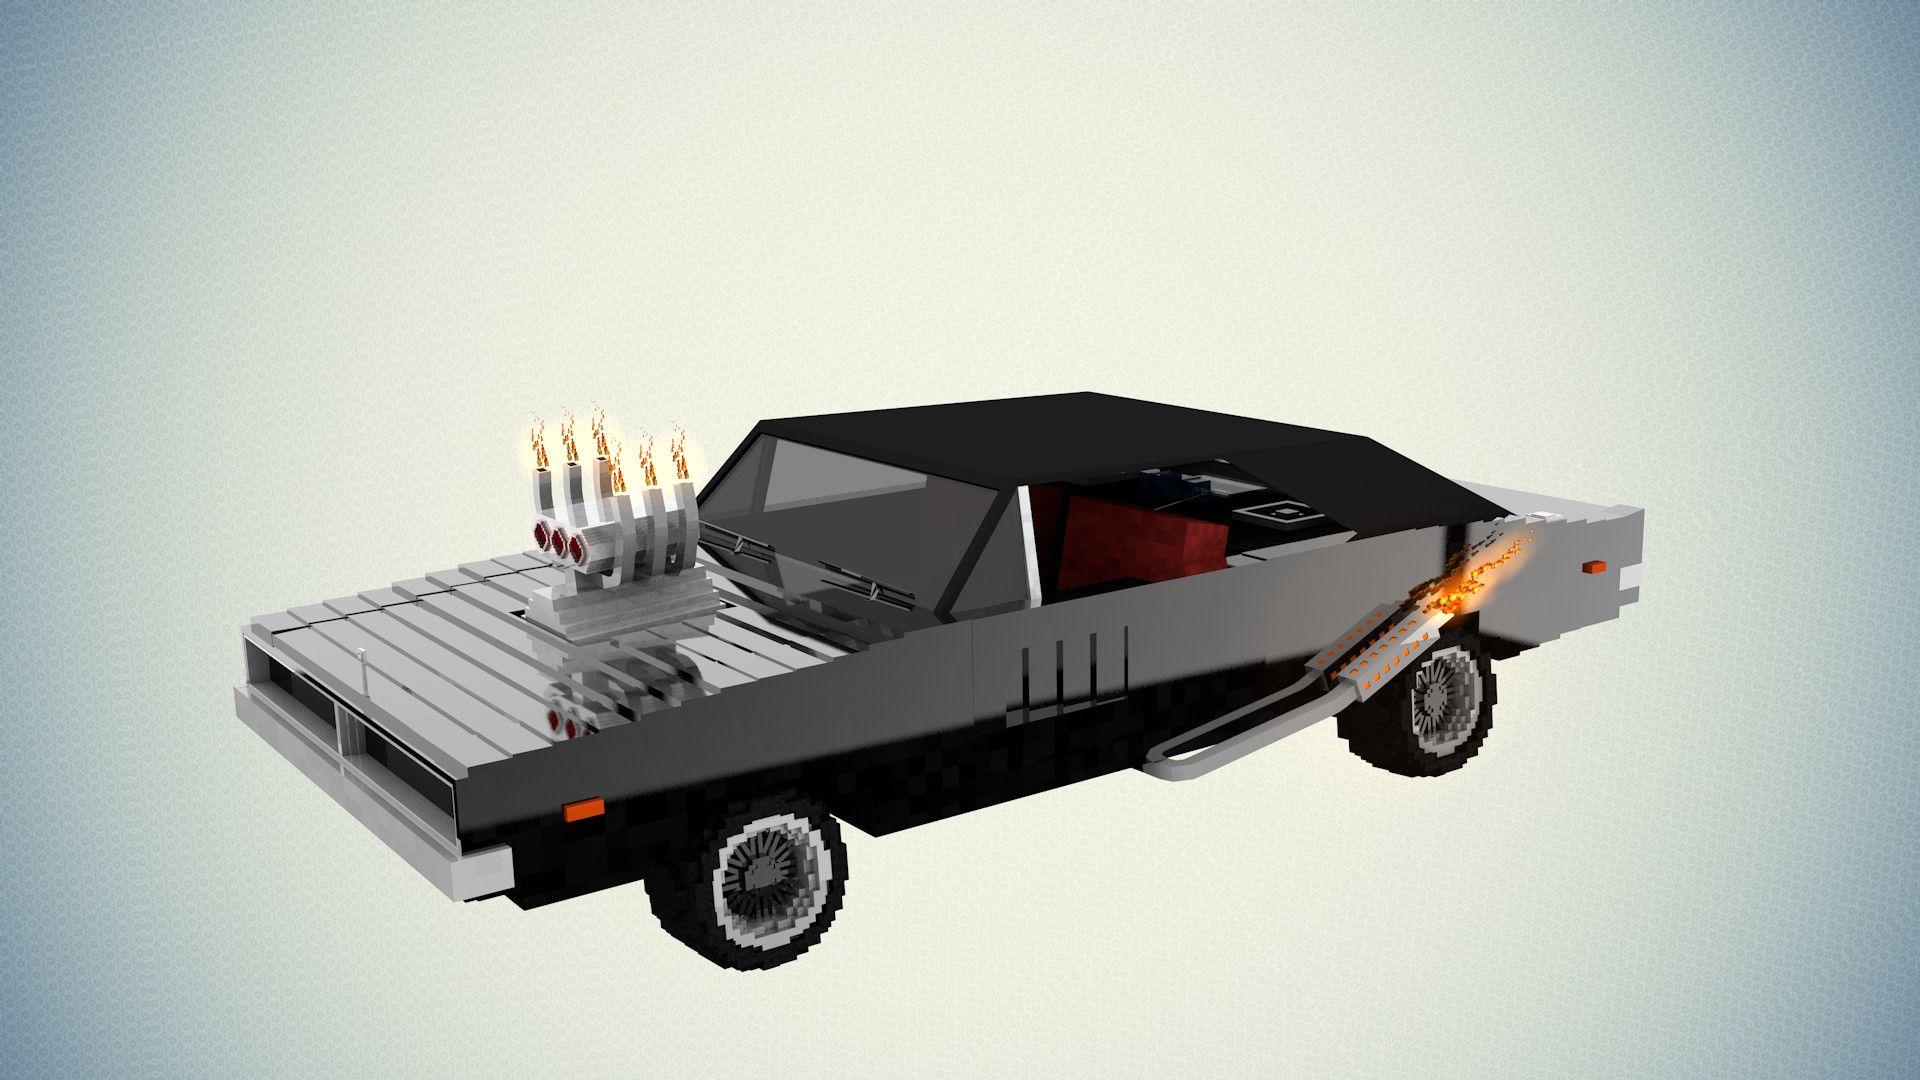 3D Model Minecraft Dodge Charger - 3D Model